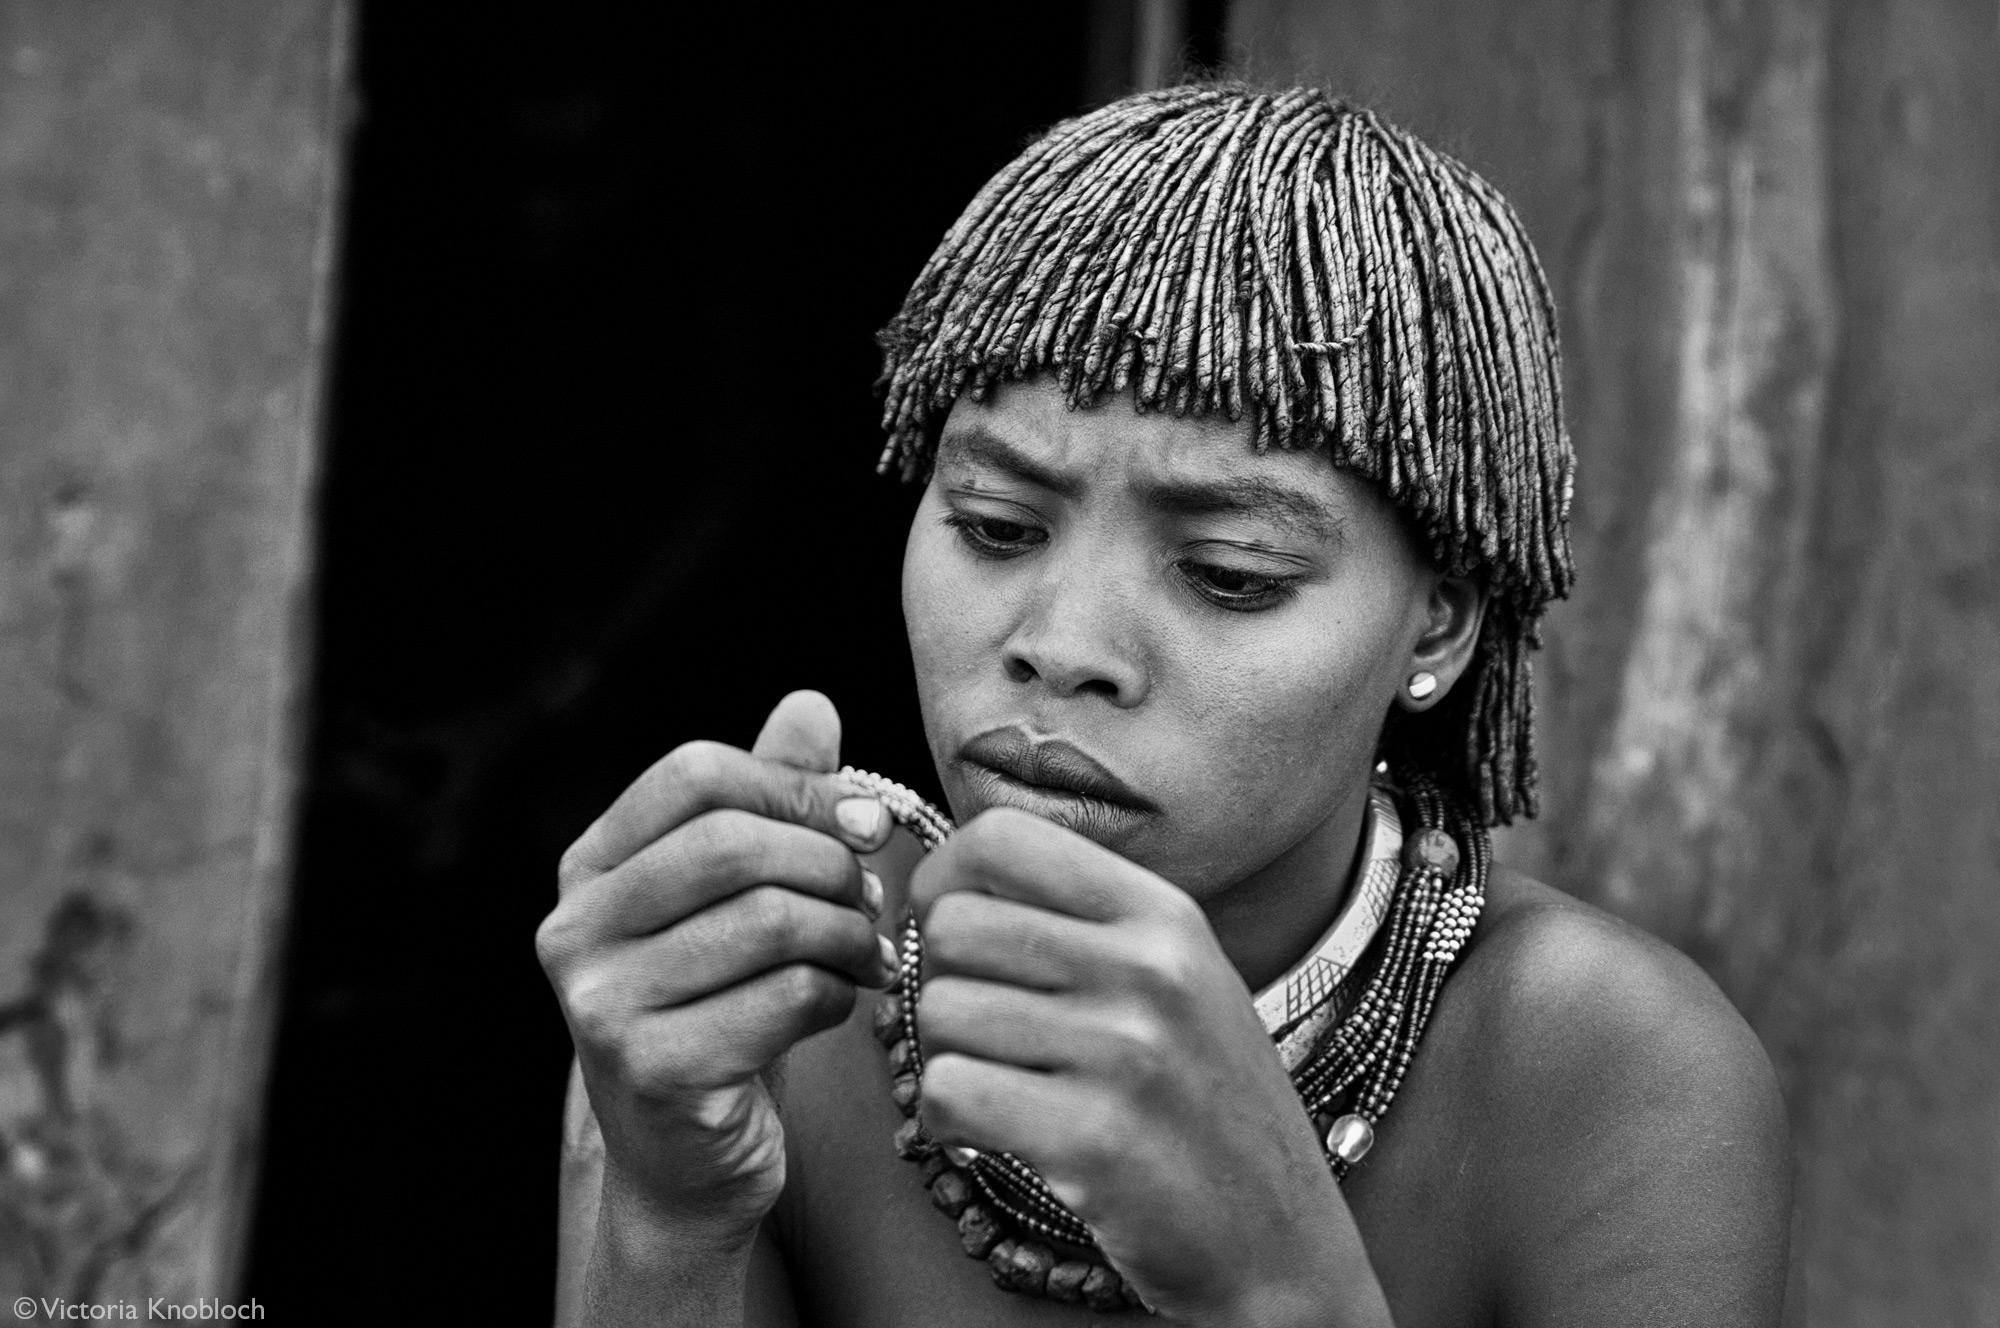 Hamer tribe woman beading, Omo Valley, Ethiopia